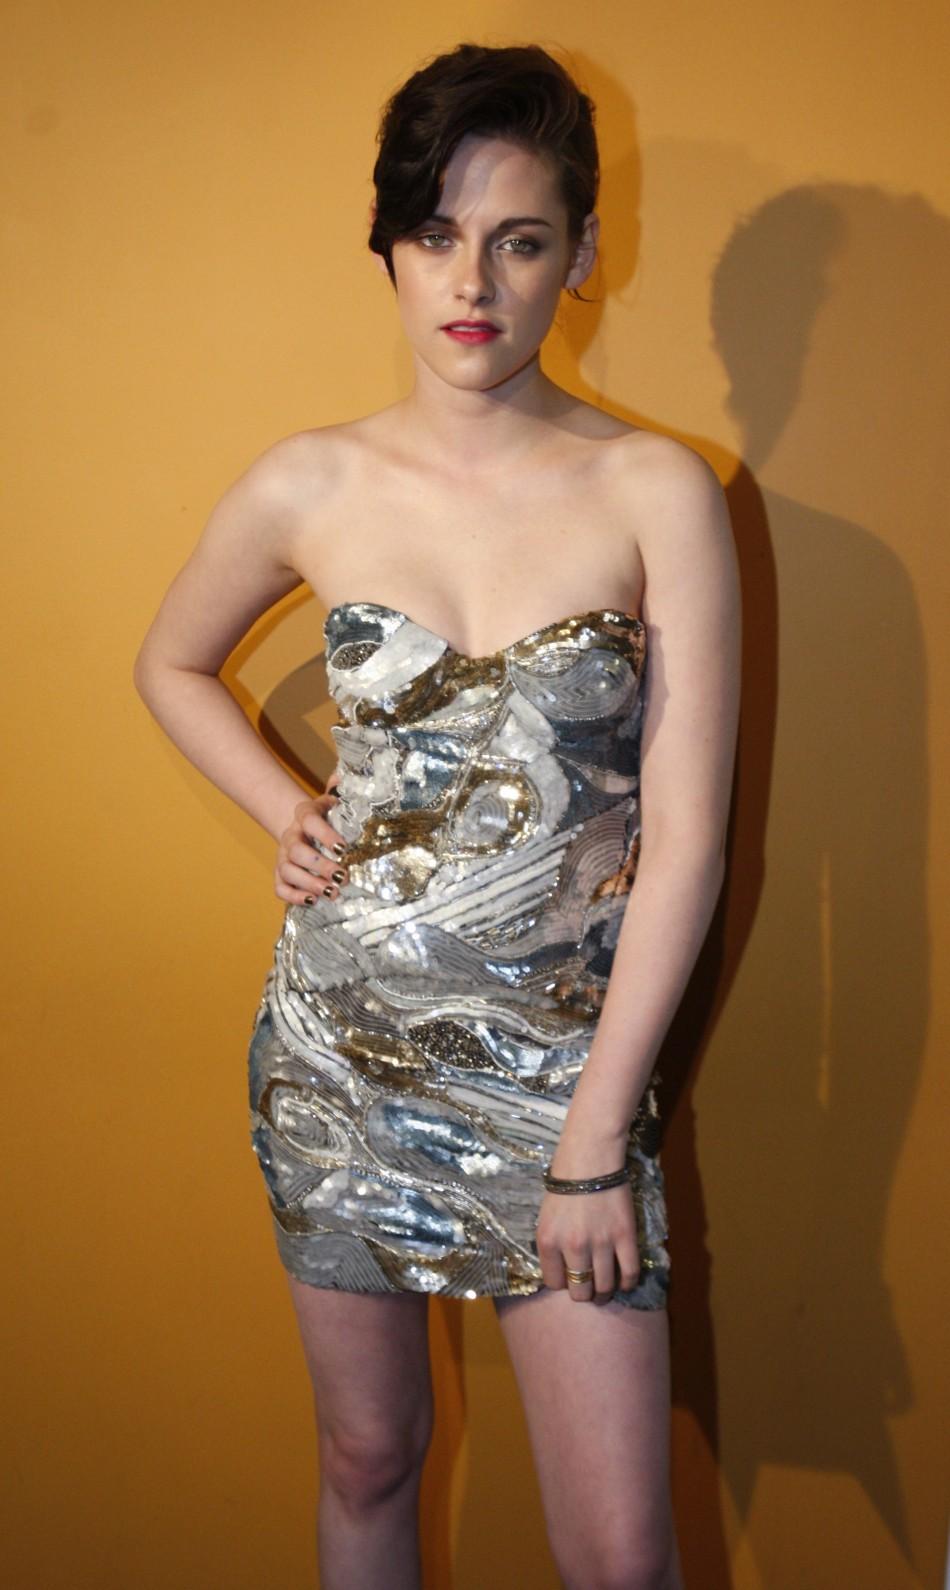 Cast member Kristen Stewart